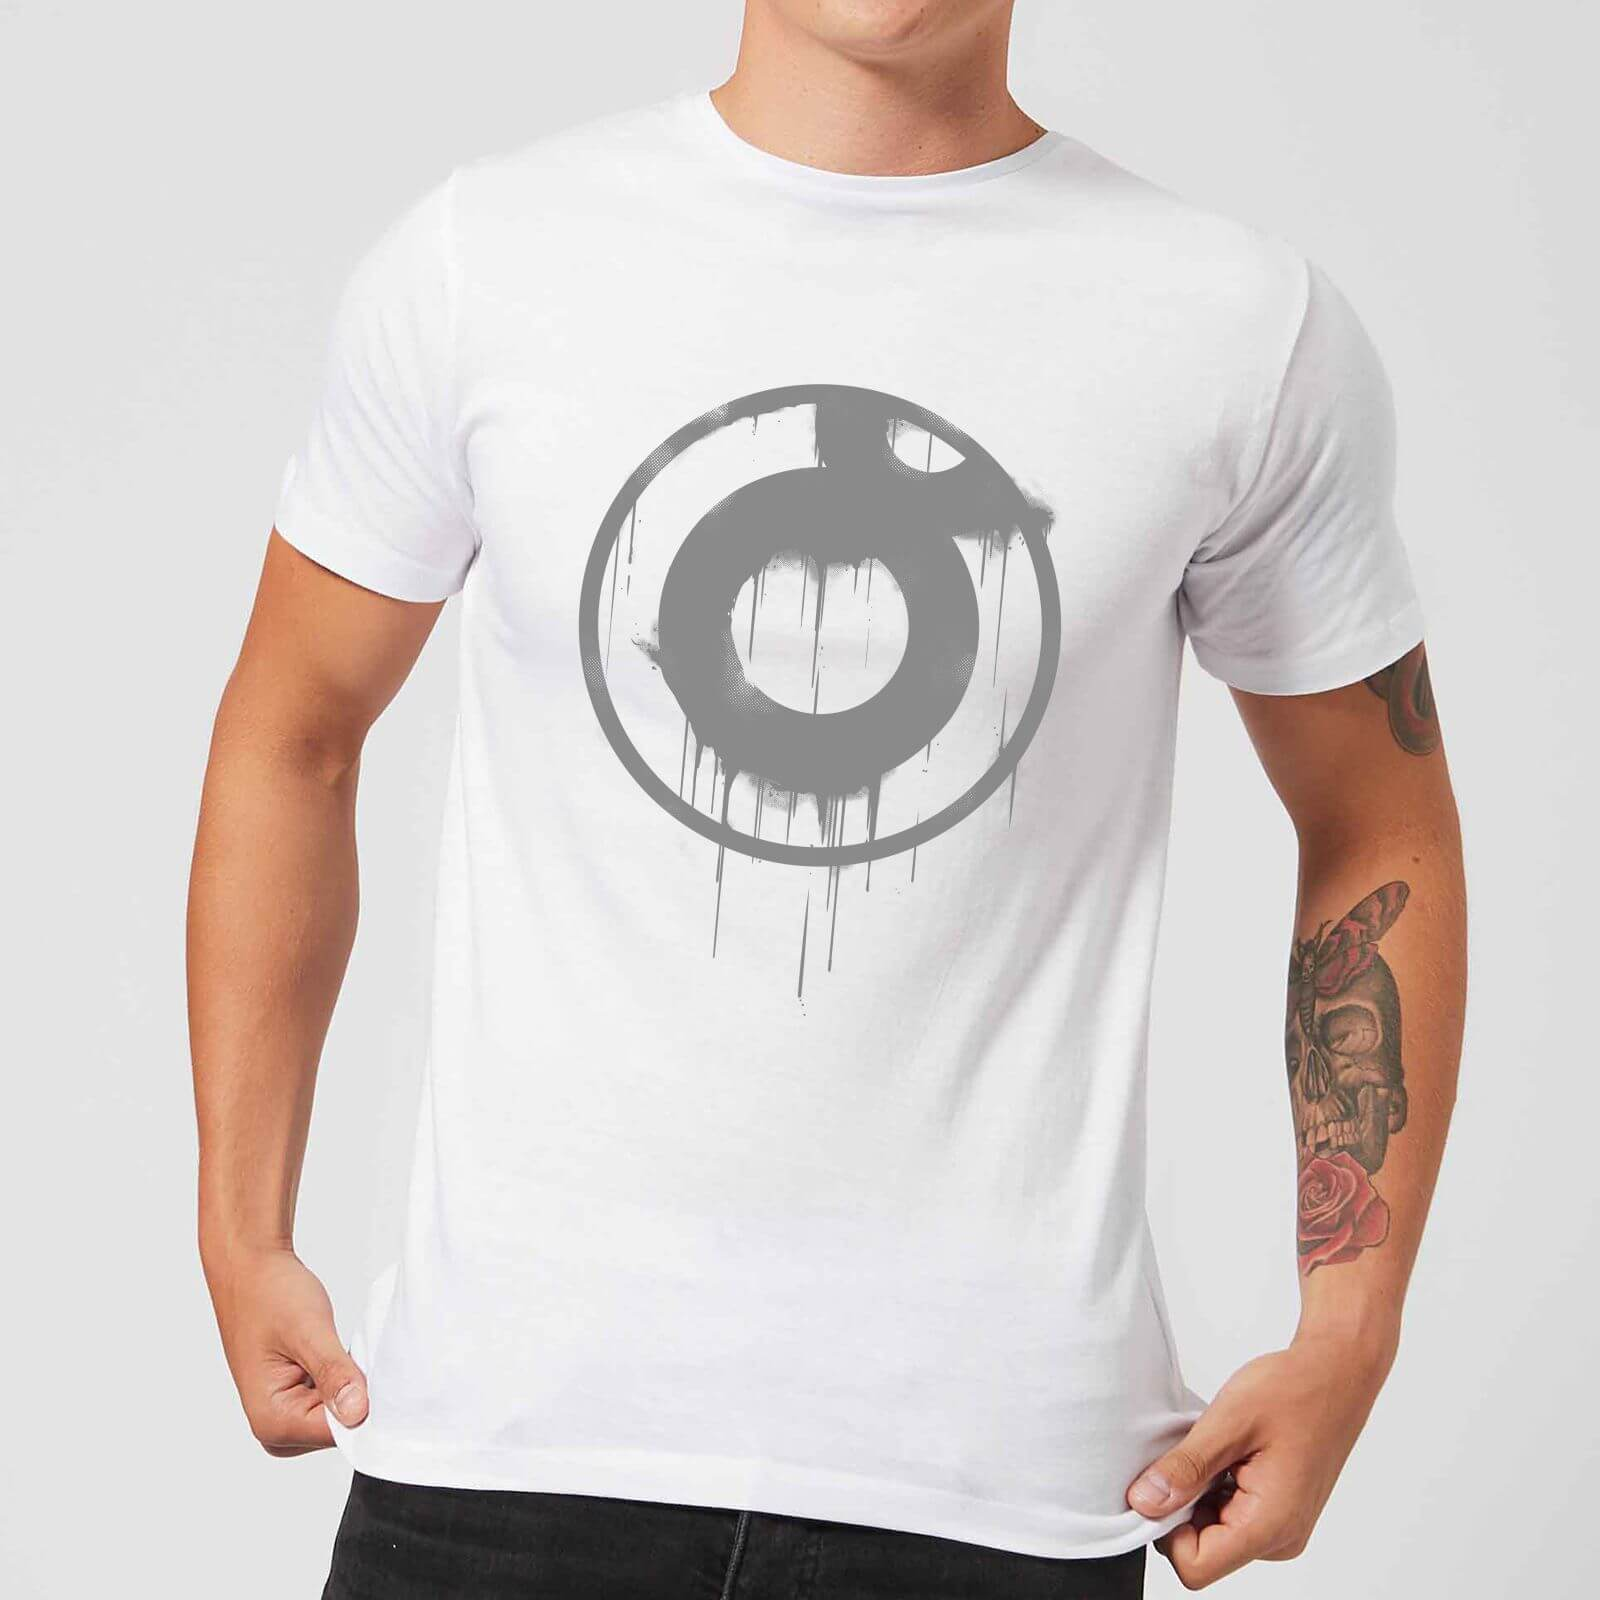 7145303e Ei8htball Spray Paint Logo Grey Men's T-Shirt - White Merchandise | Zavvi